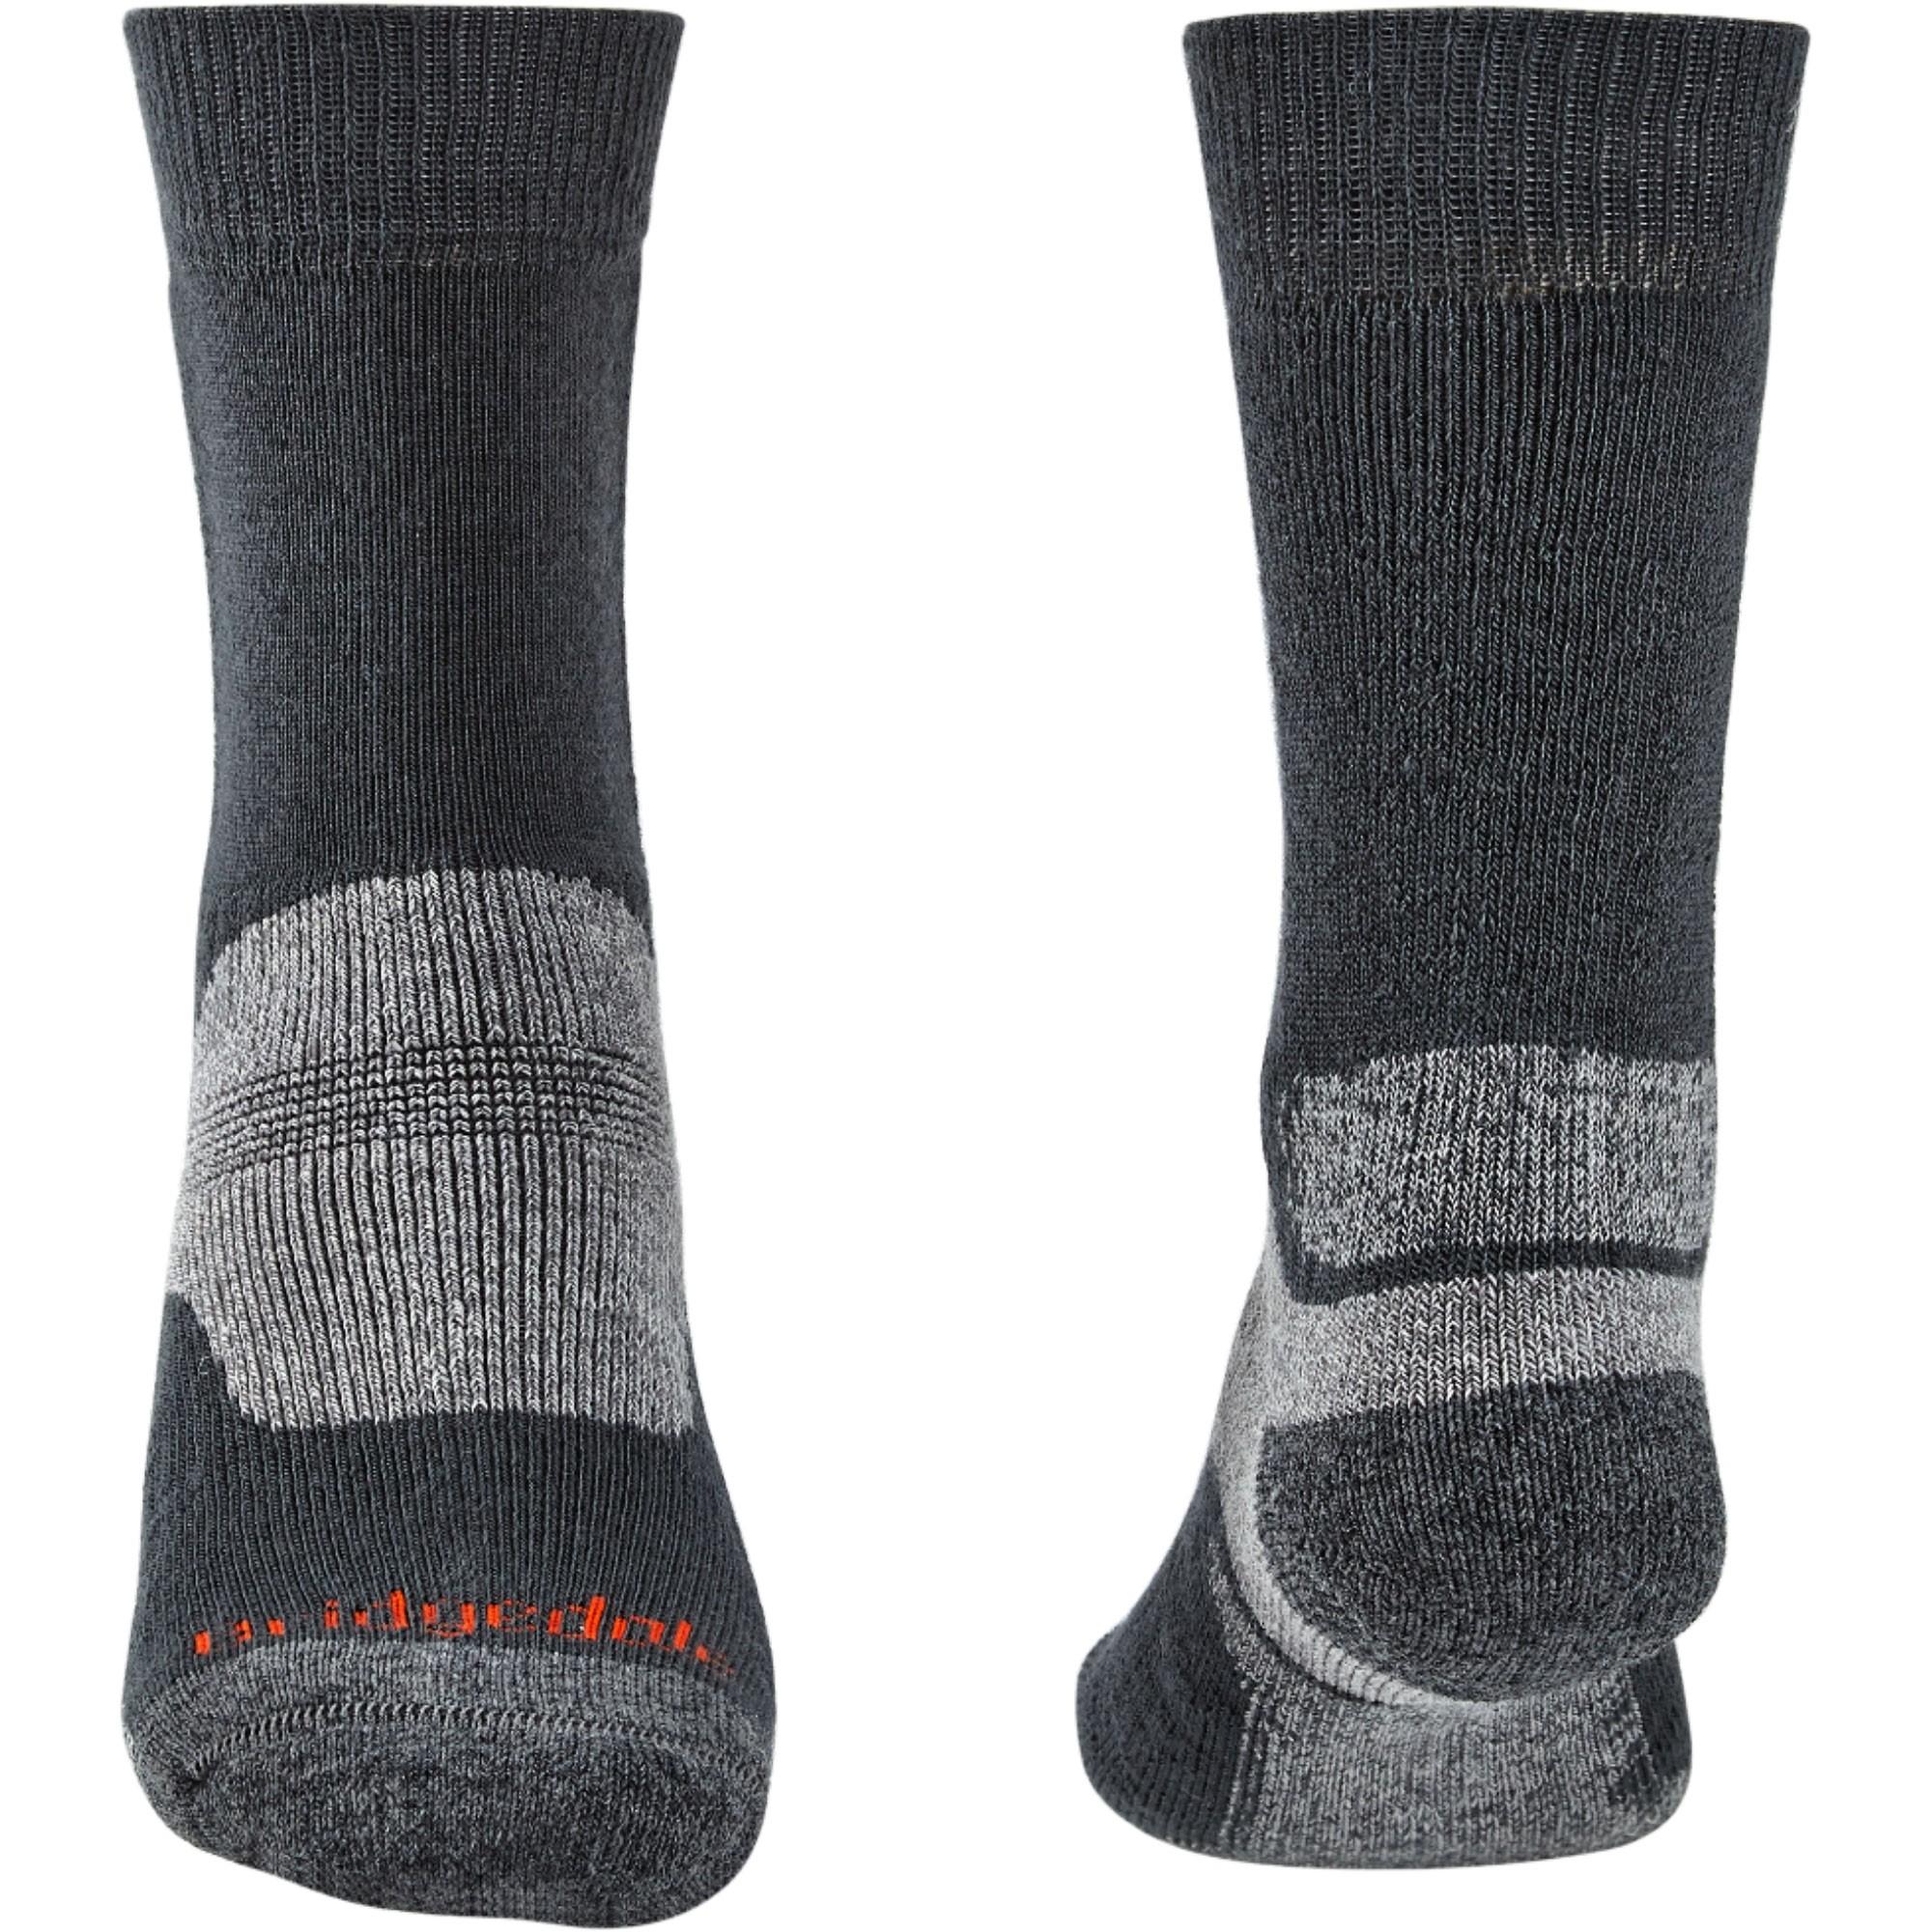 Bridgedale Hike Midweight Merino Endurance Men's Socks - Gunmetal